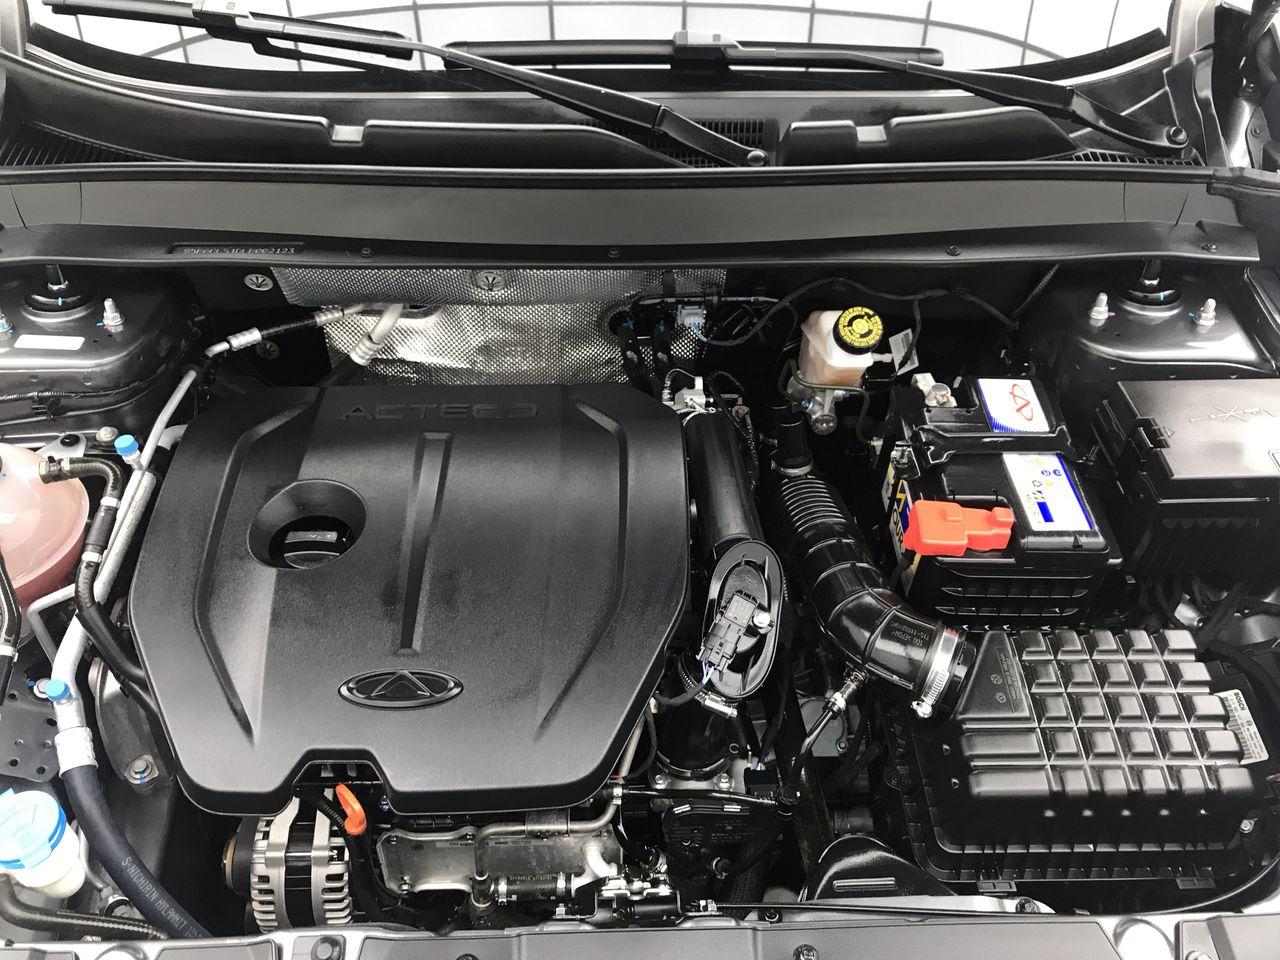 Tiggo 7 TXS 1.5 16V Turbo Flex Aut.